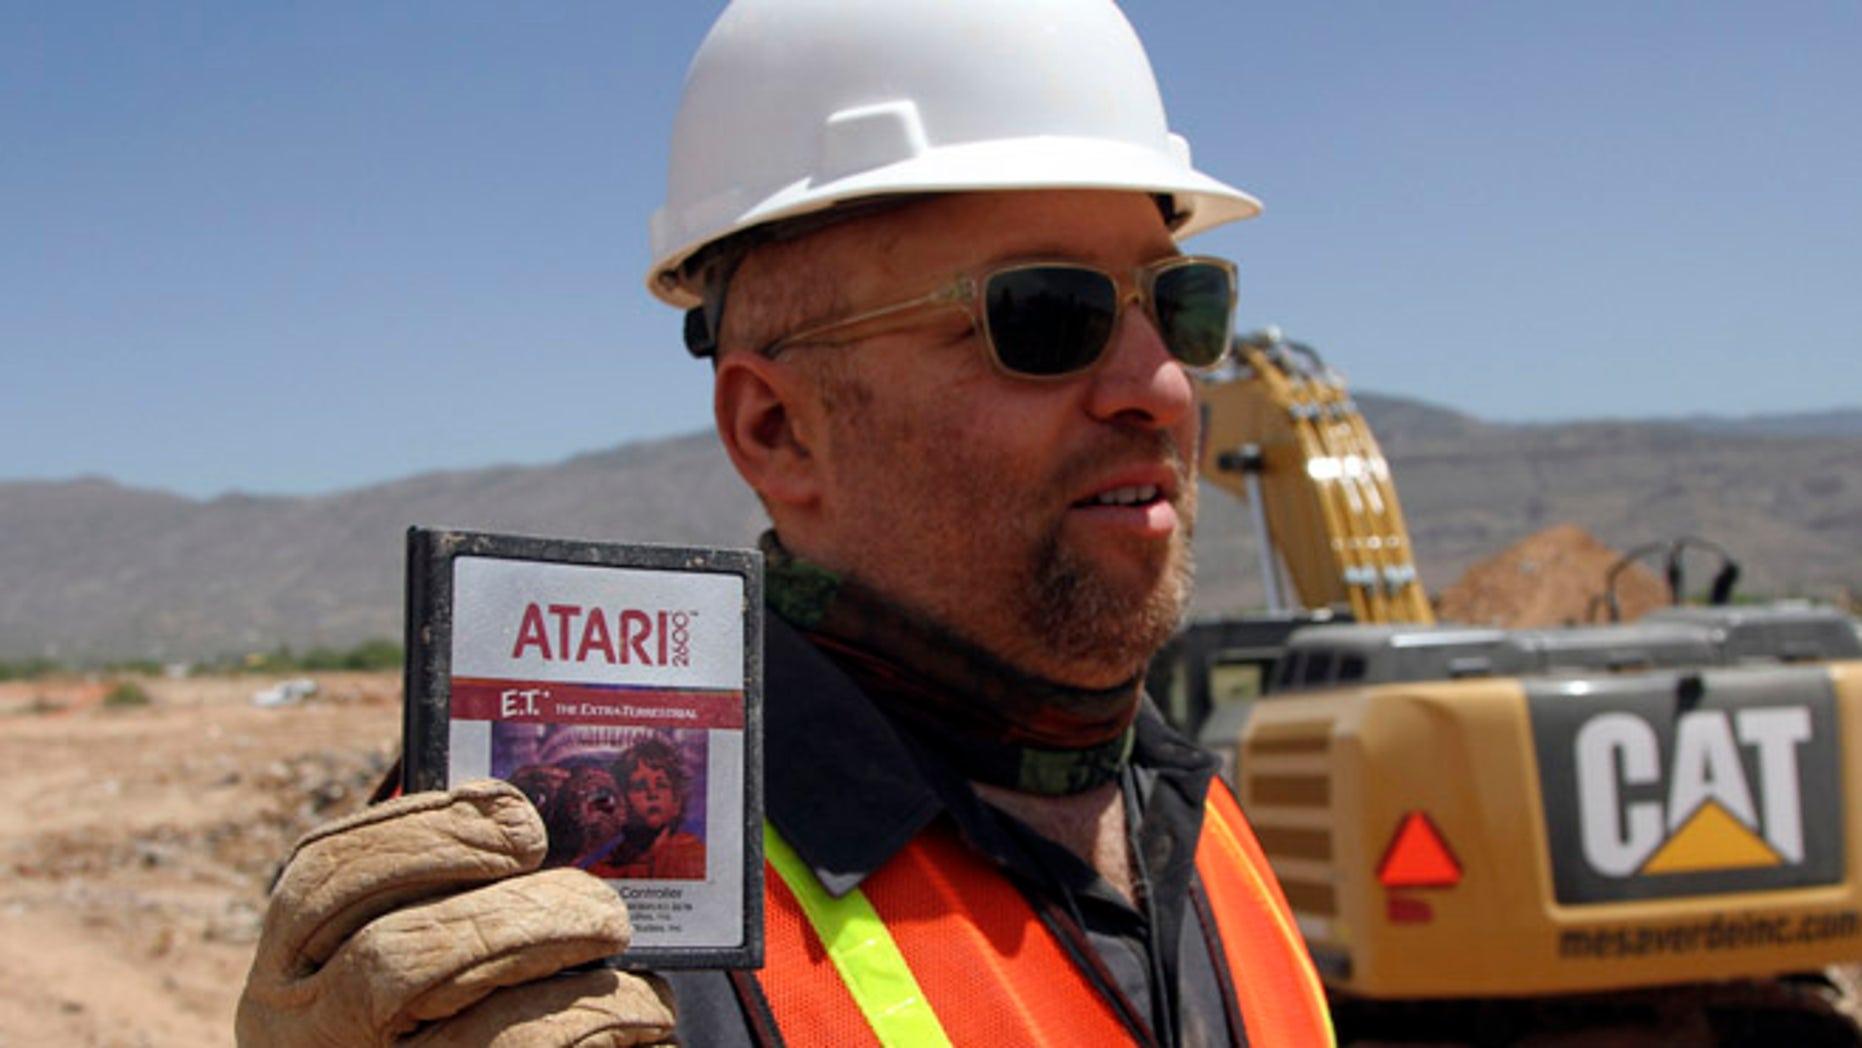 Apr. 26, 2014: Film Director Zak Penn shows a box of a decades-old Atari 'E.T. the Extra-Terrestrial' game found in a dumpsite in Alamogordo, N.M.